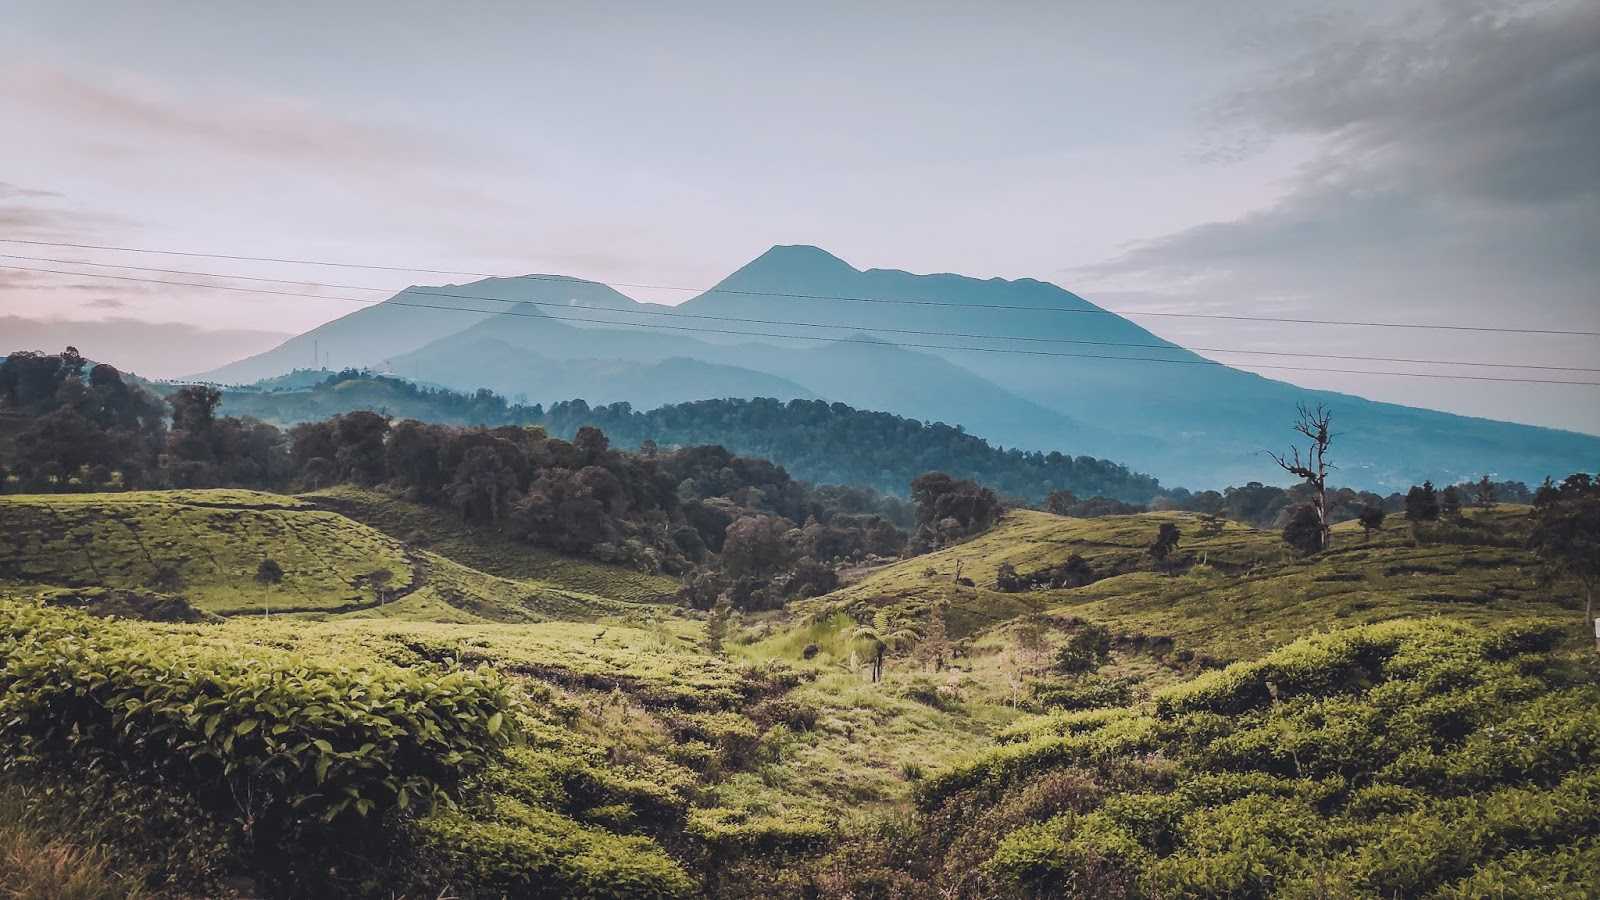 Pendakian Gunung Kencana Bogor 1803MDPL viaTelaga Warna